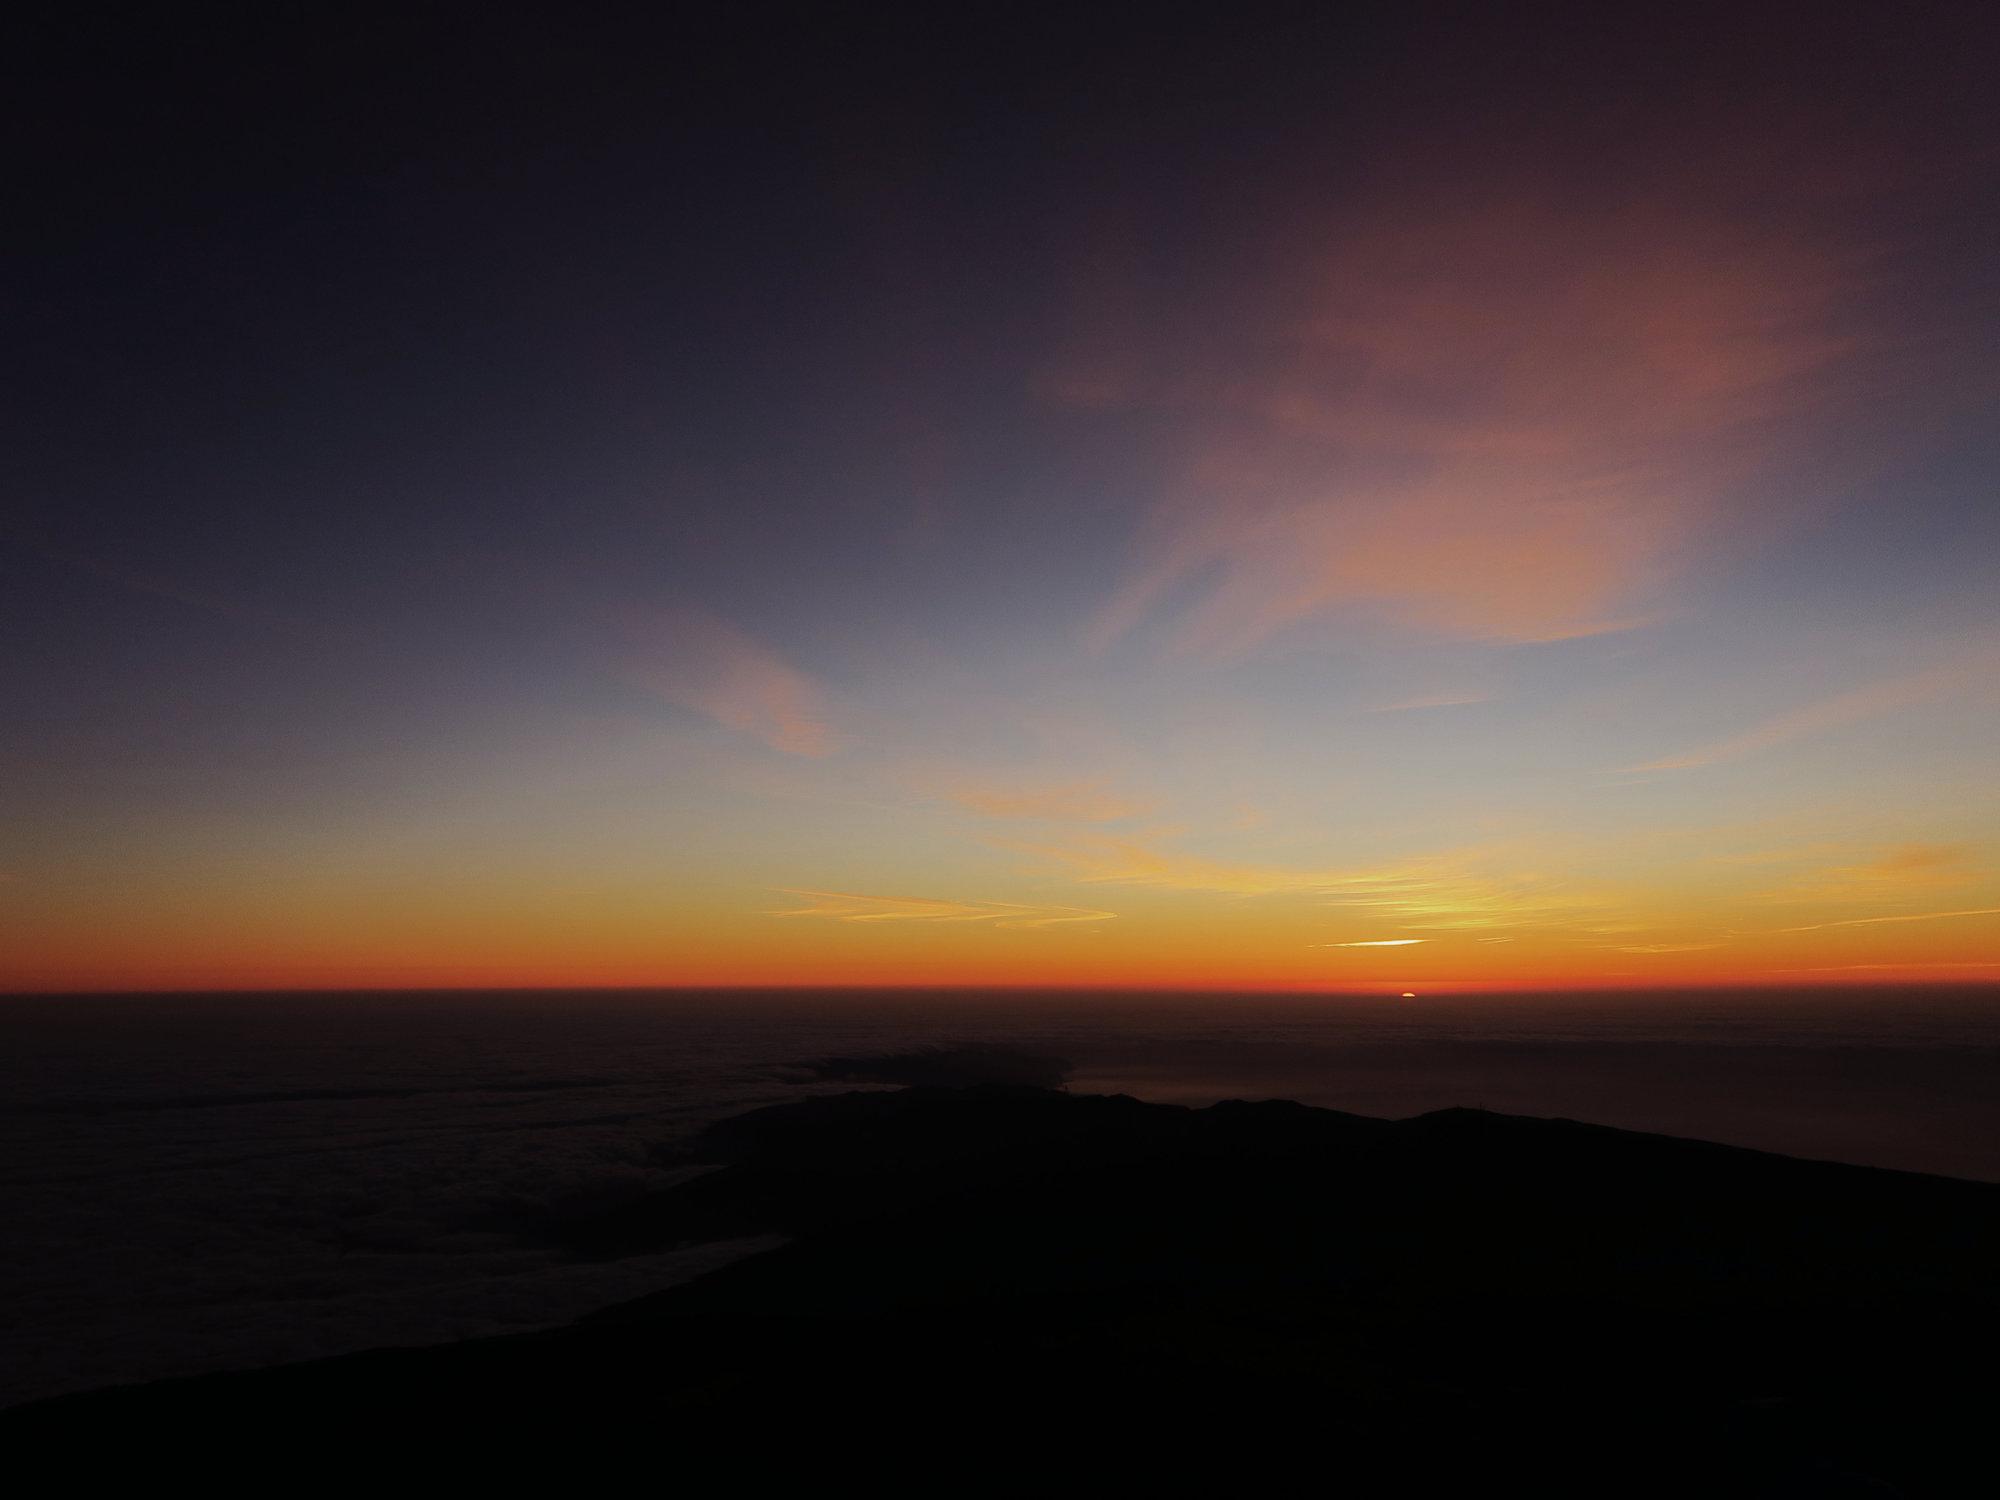 Sonnenaufgang vom Pico del Teide wie aus dem Bilderbuch